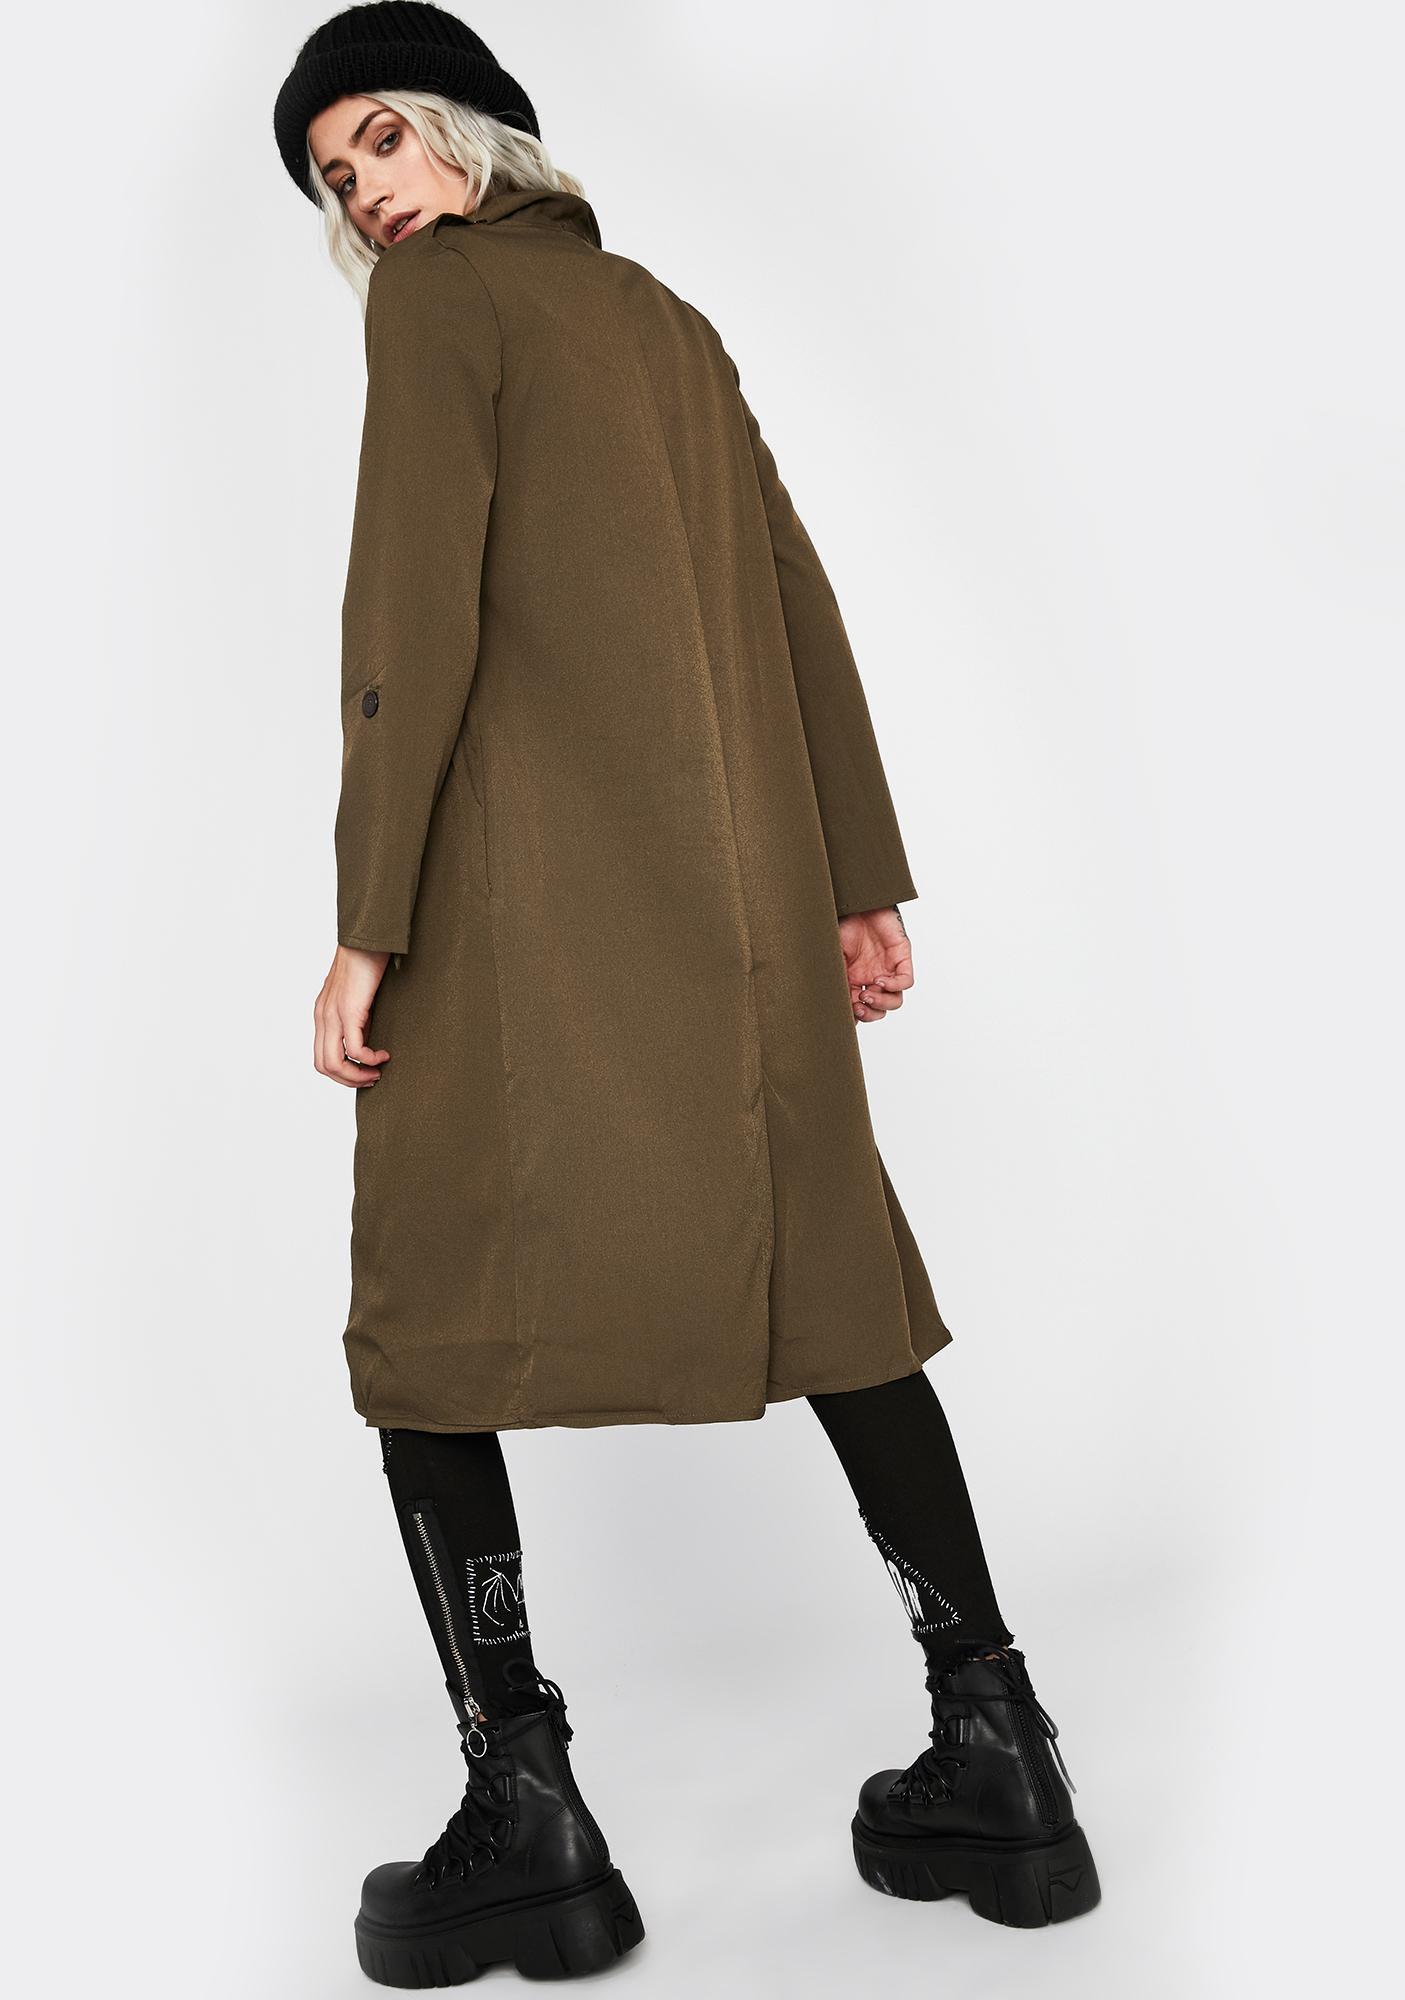 Reformed Rebel Trench Coat